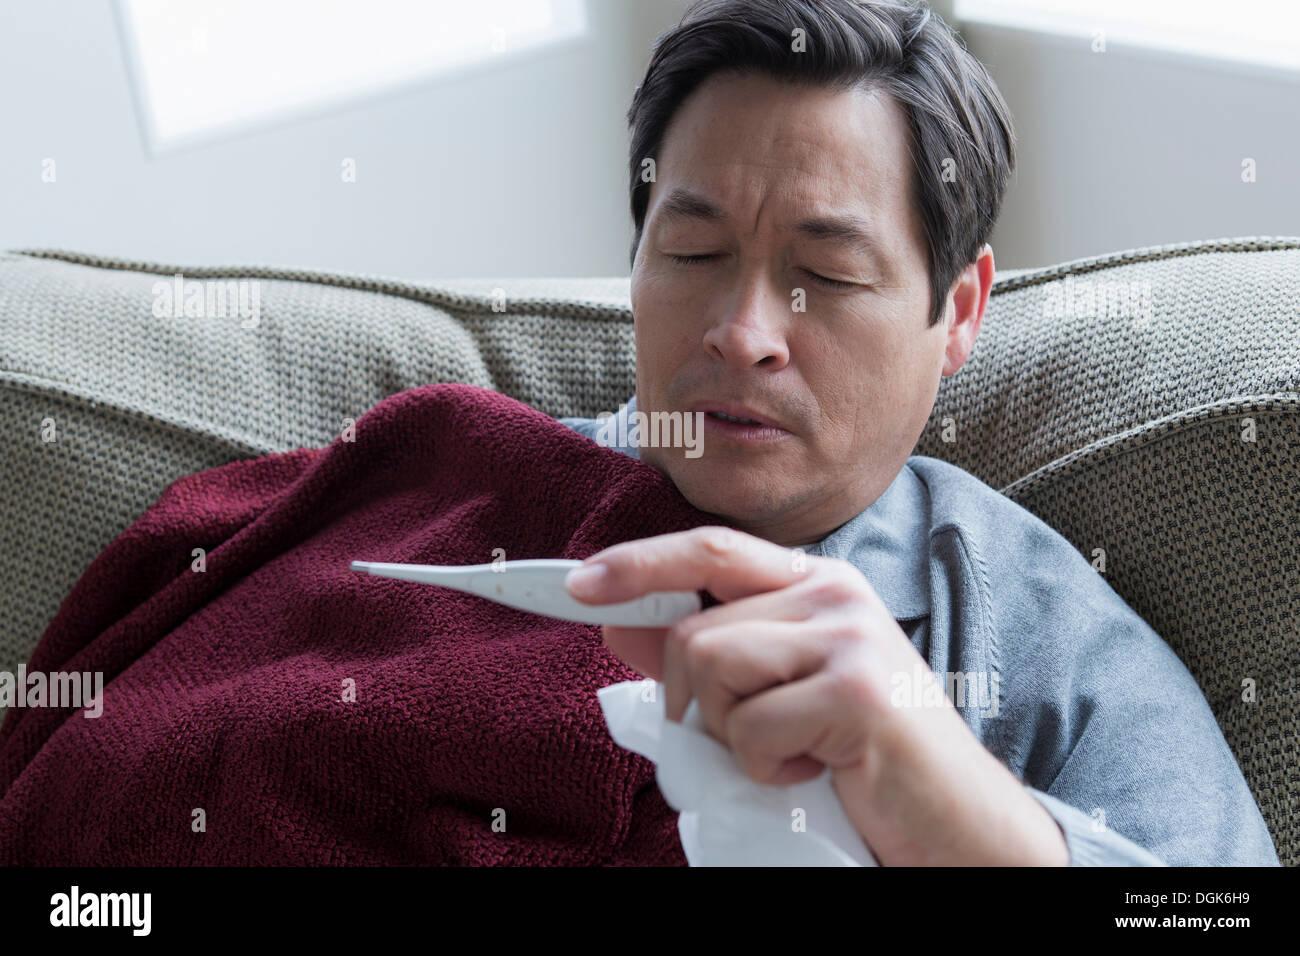 Mature man taking temperature - Stock Image